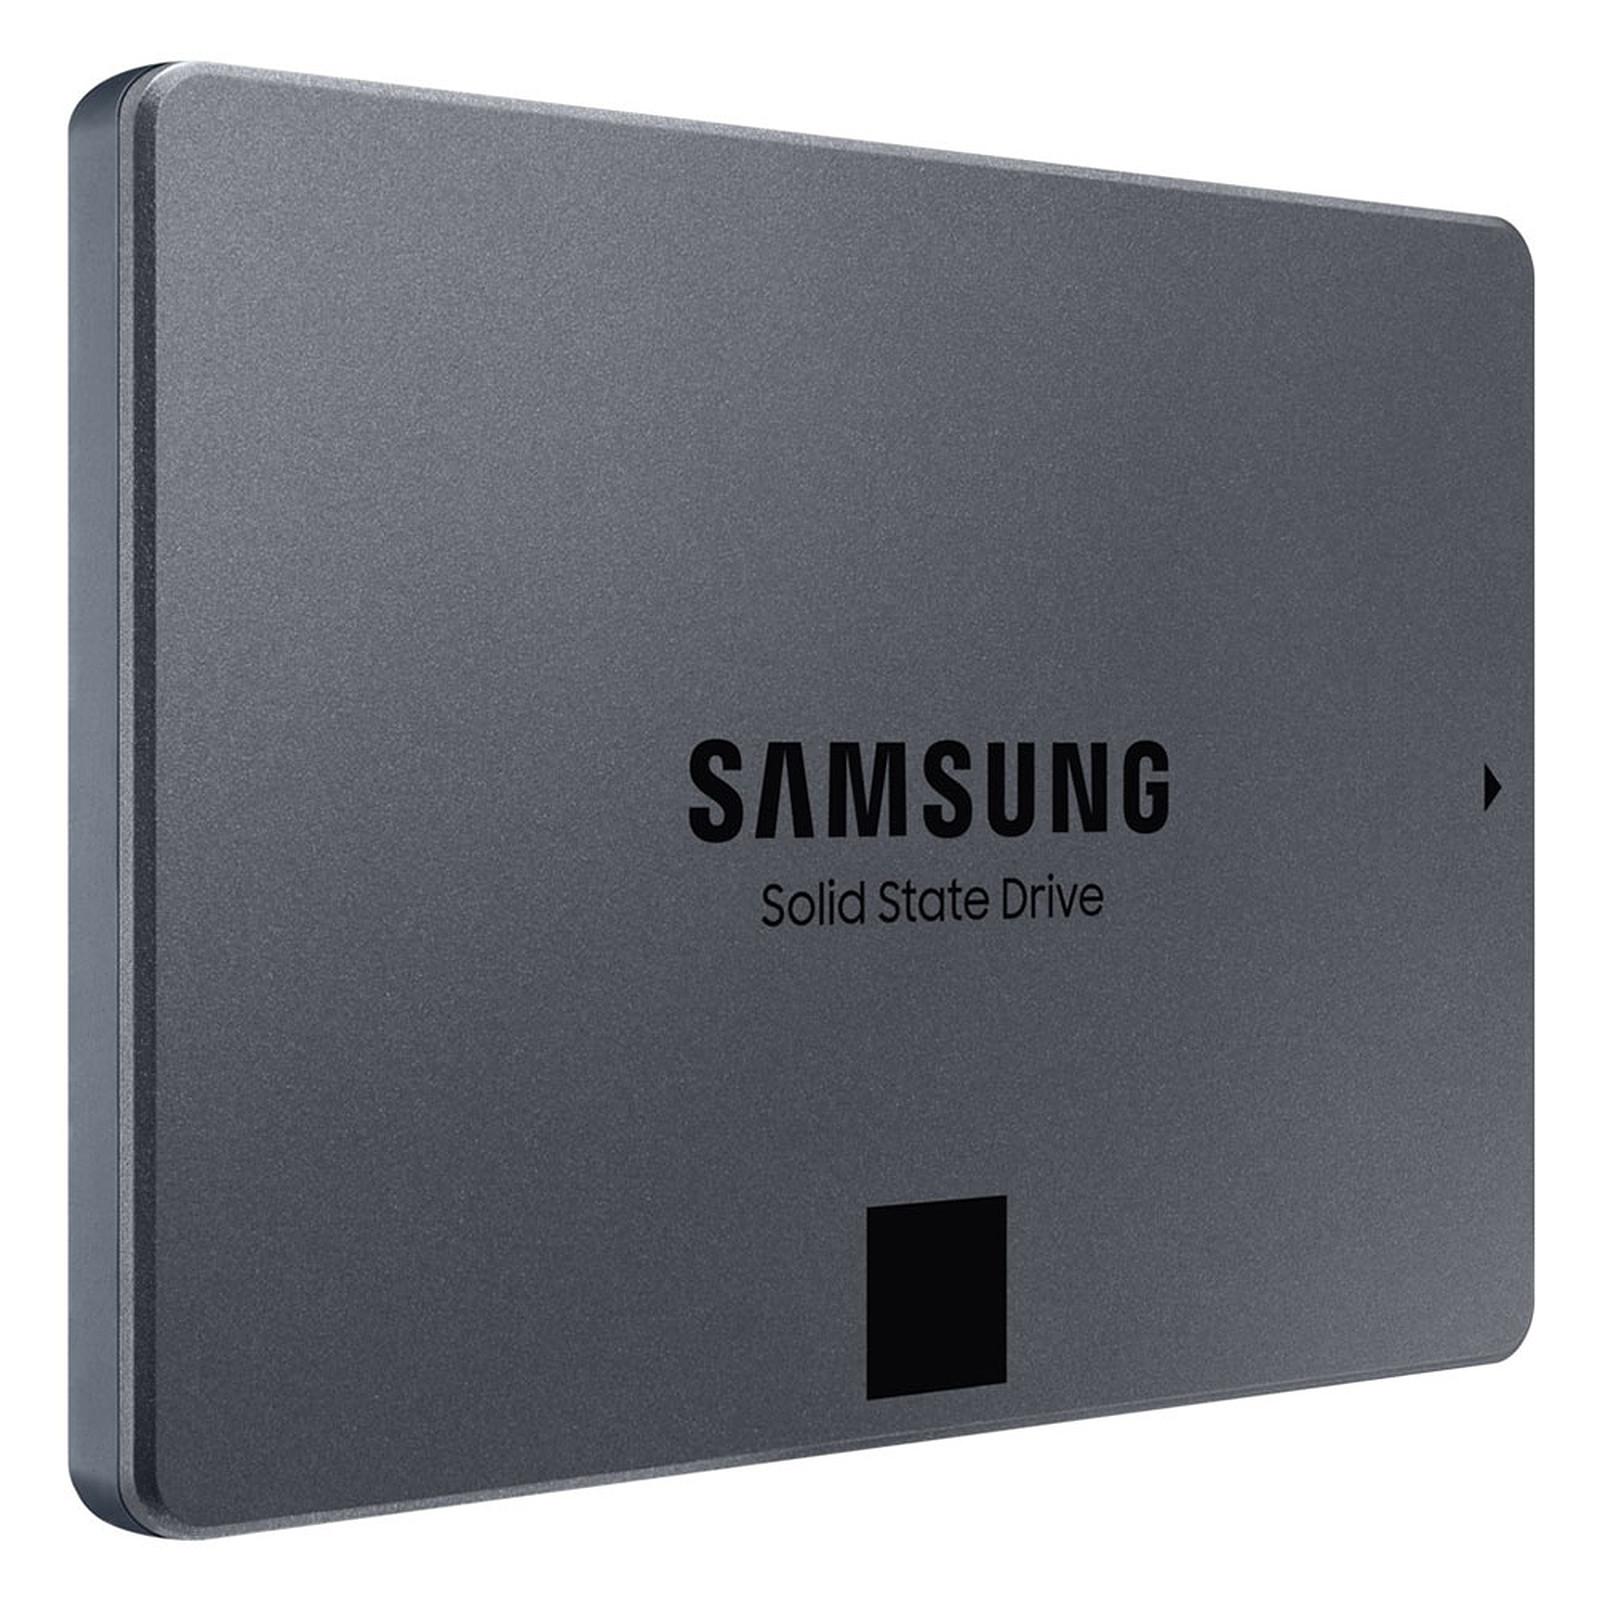 Samsung SSD 860 QVO 2 To